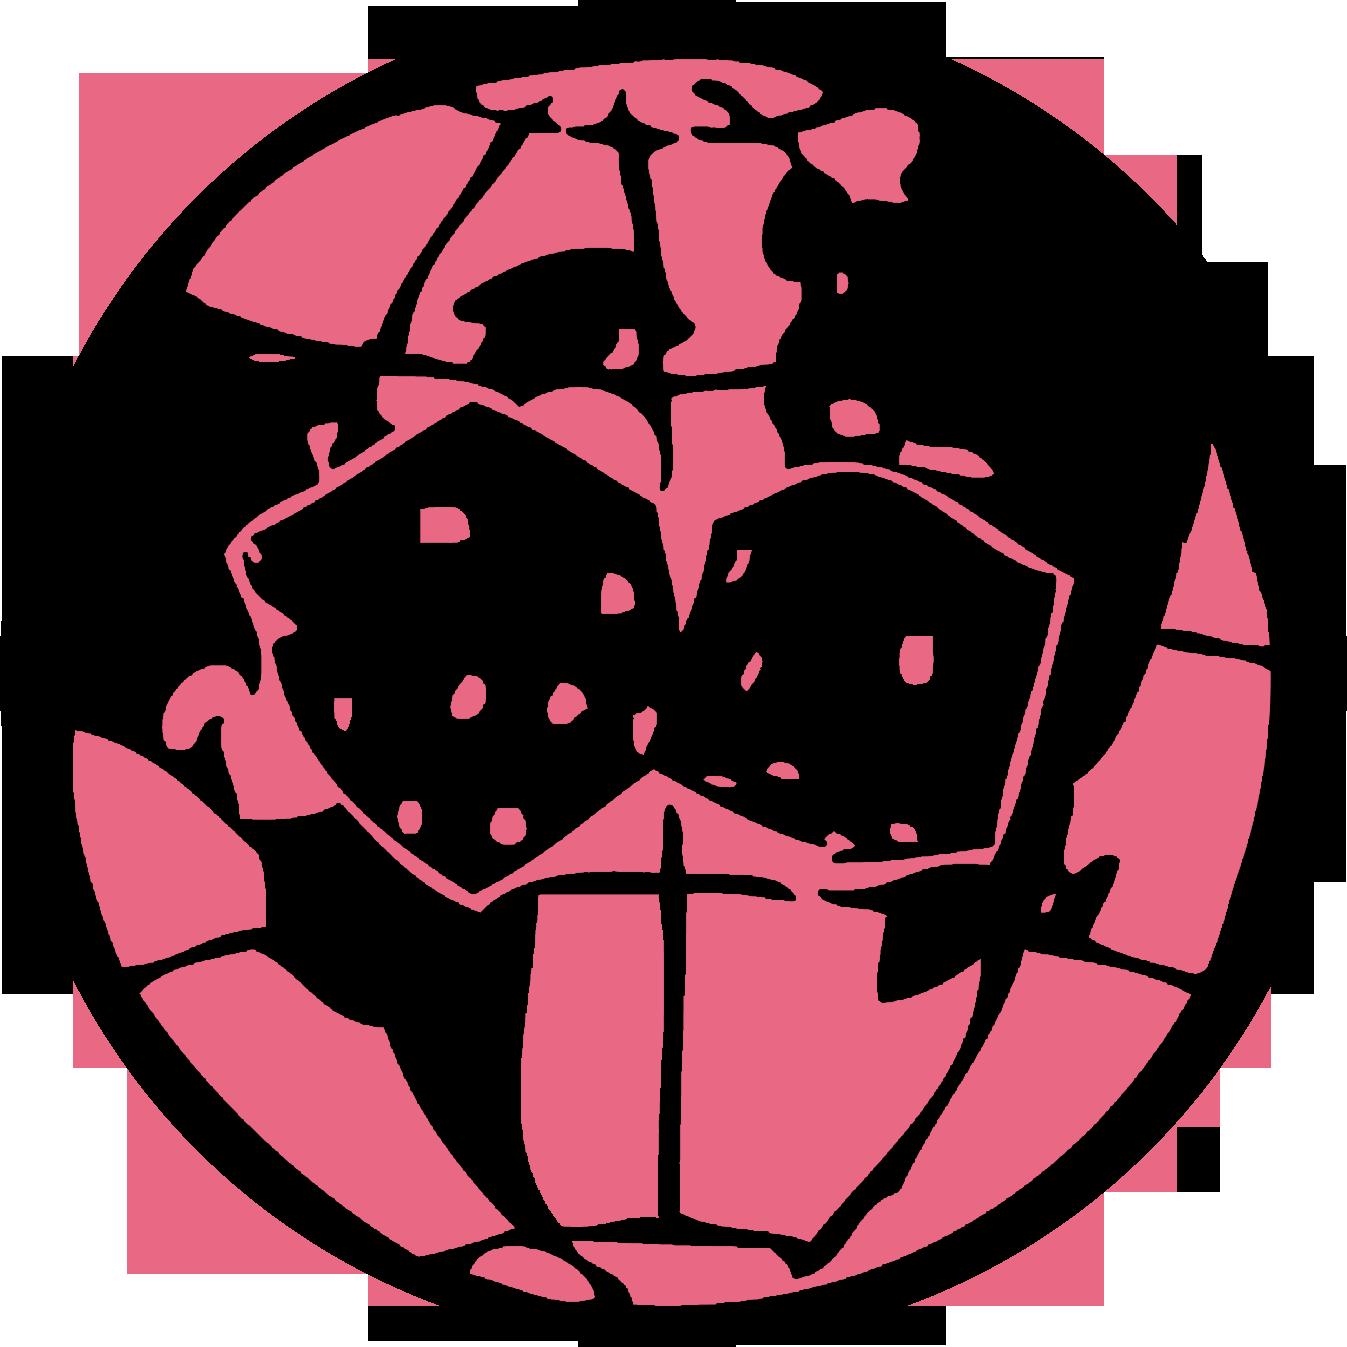 AMLOGO - Rosa GI